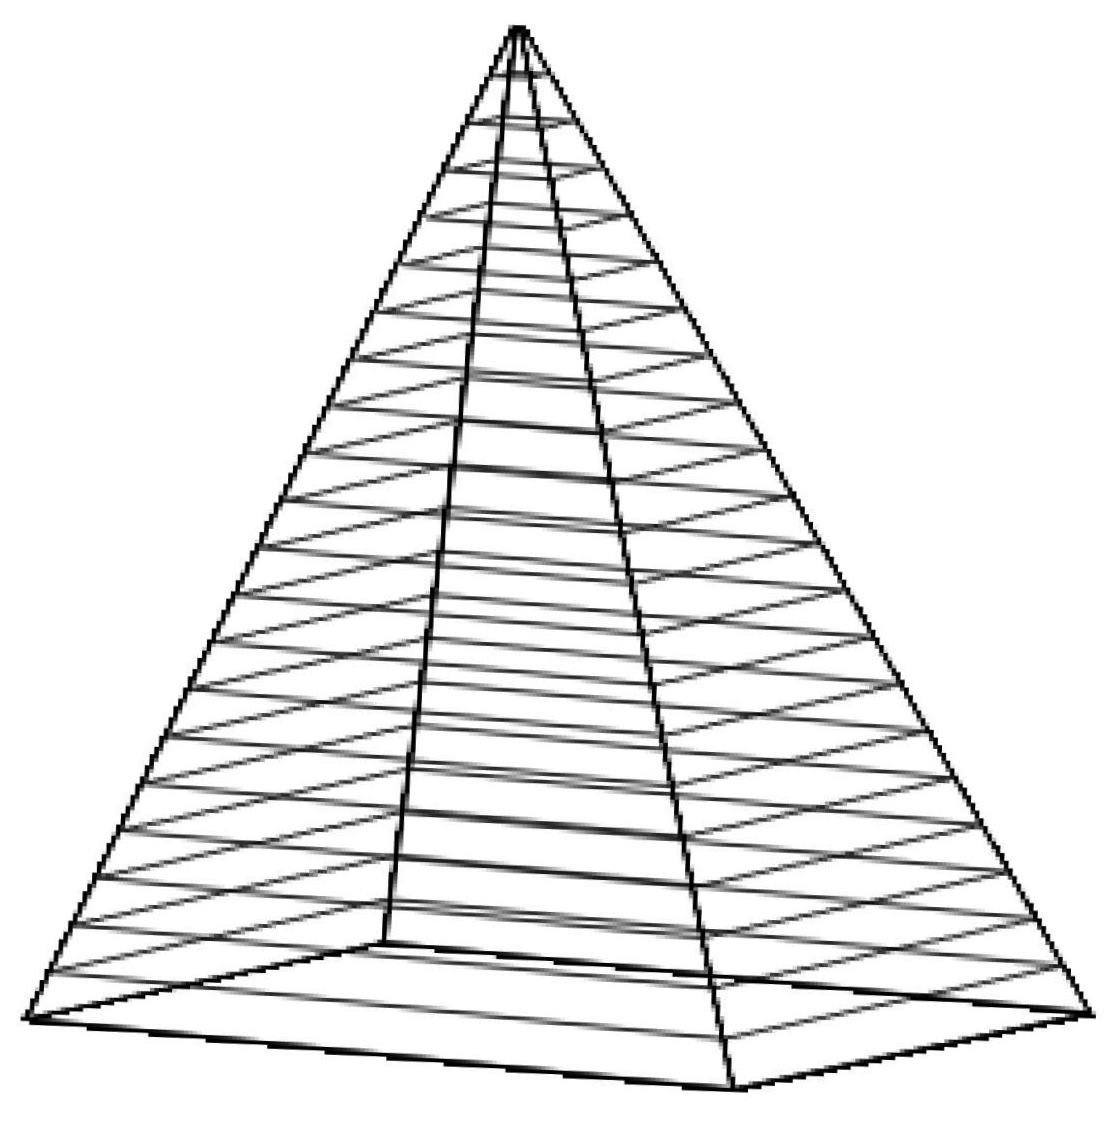 pyramida, Αγγελική Αναγνώστου, Αντέχεις την Αλήθεια, το χρονικό της αιχμαλωσίας, το τελευταίο κάλεσμα, υπερσύμπαντα, υπερσύμπαν,